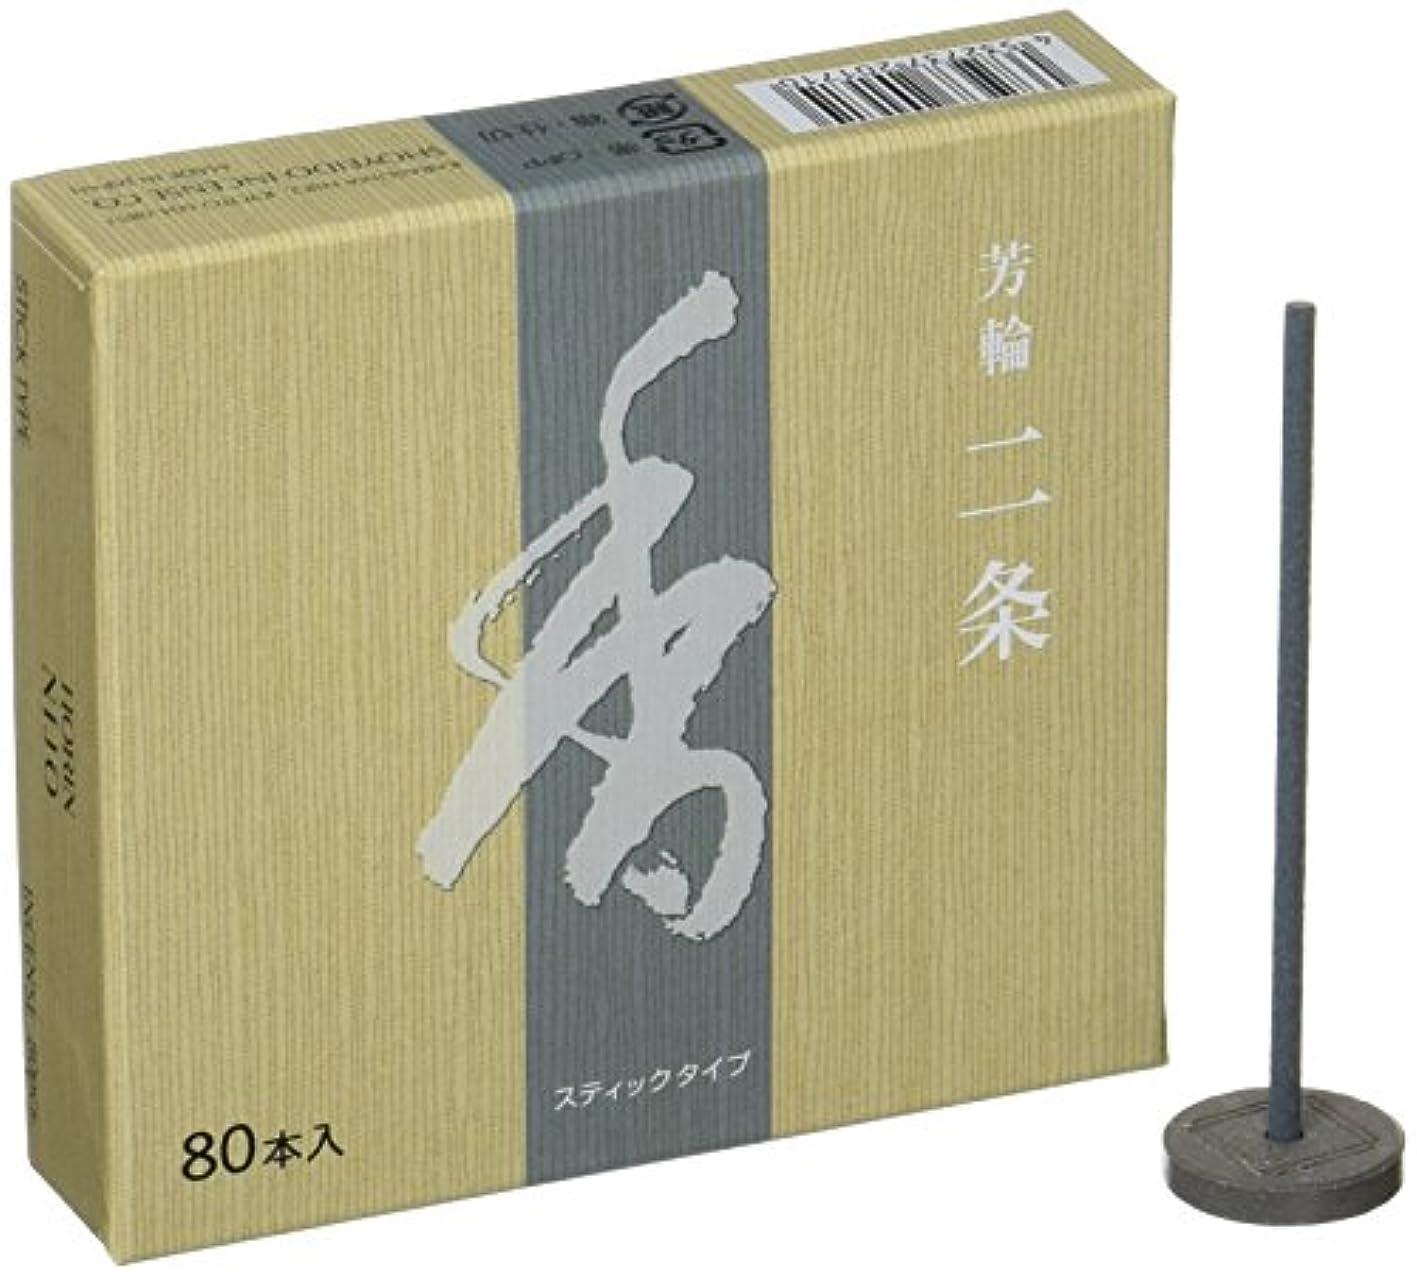 有益使用法運河松栄堂 芳輪 二条 スティック型 80本入